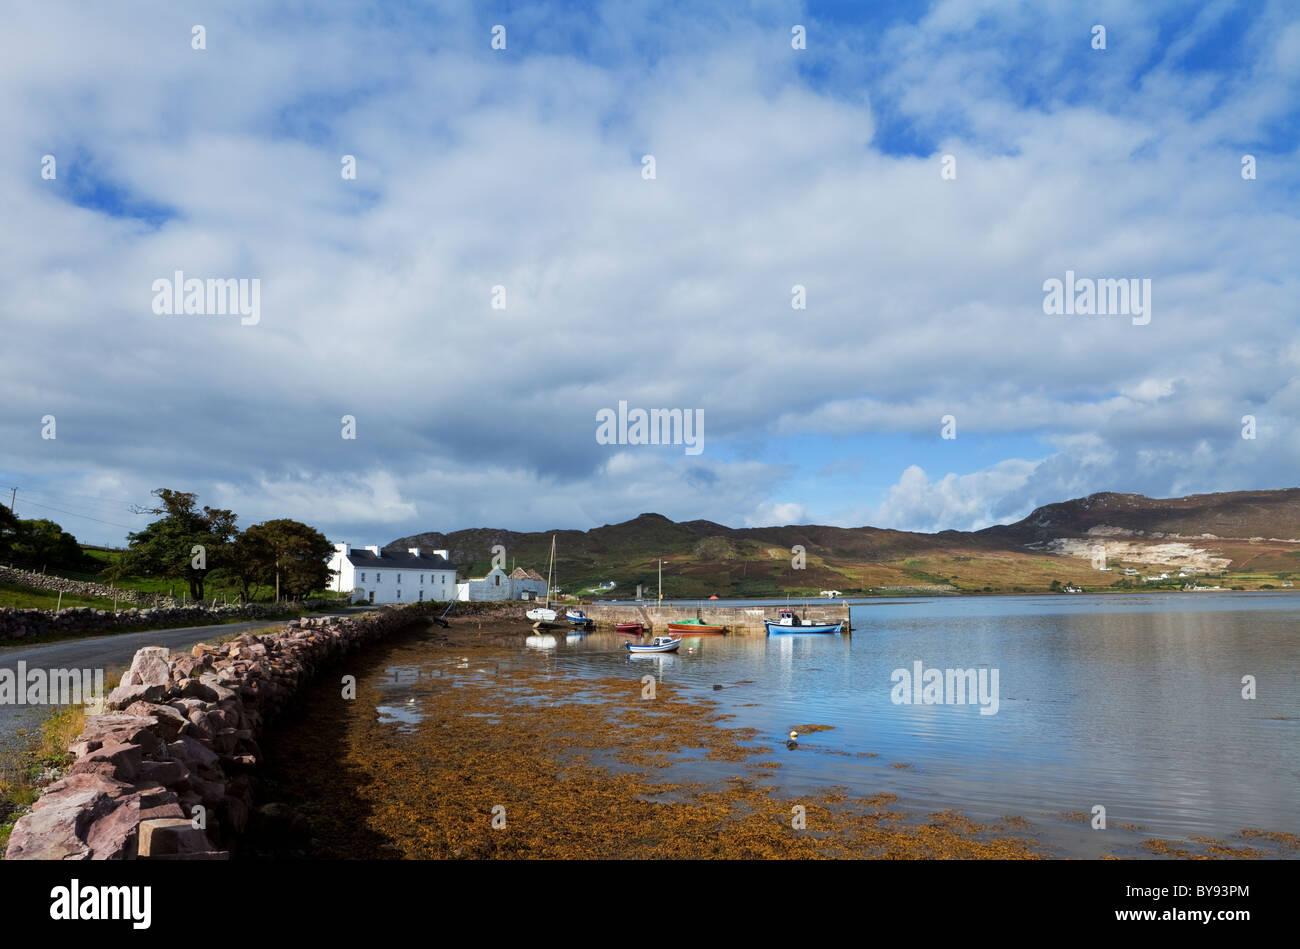 Small Fishing Harbour on Achill Sound, Corraun Peninsula, County Mayo, Ireland - Stock Image